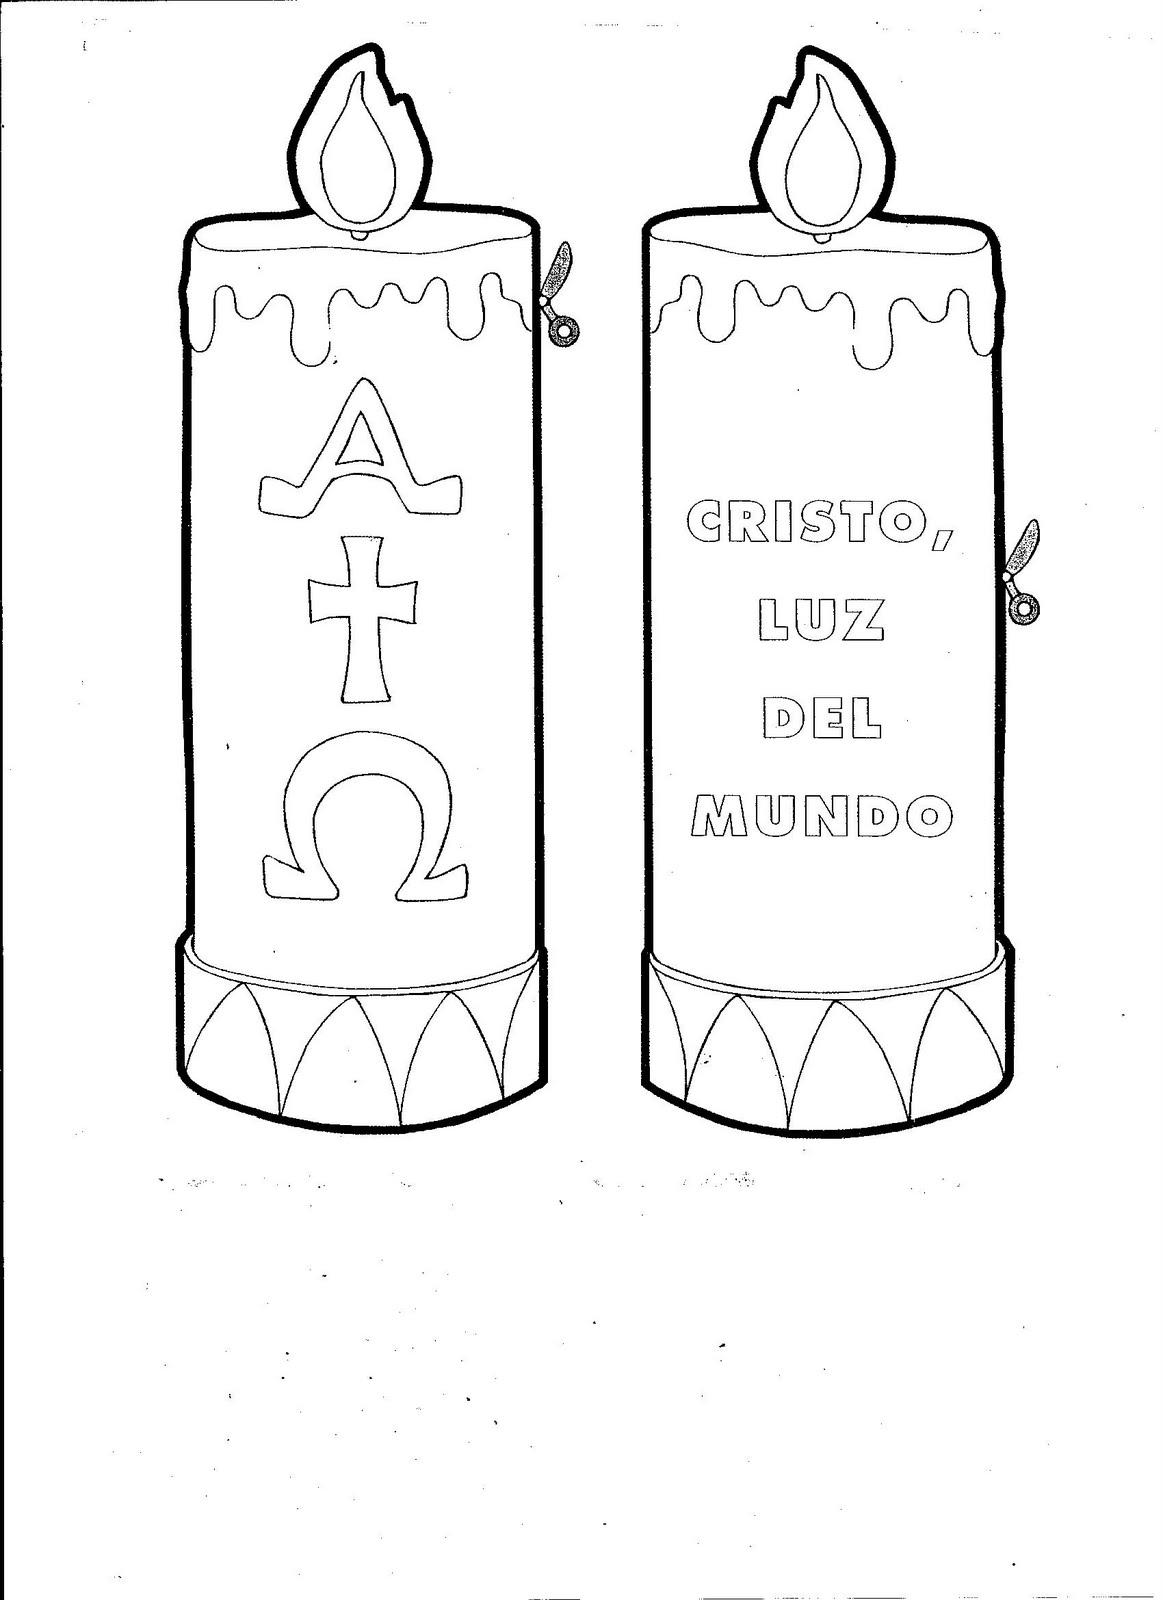 CLASE DE RELIGIÓN: FICHAS PARA LA PASCUA